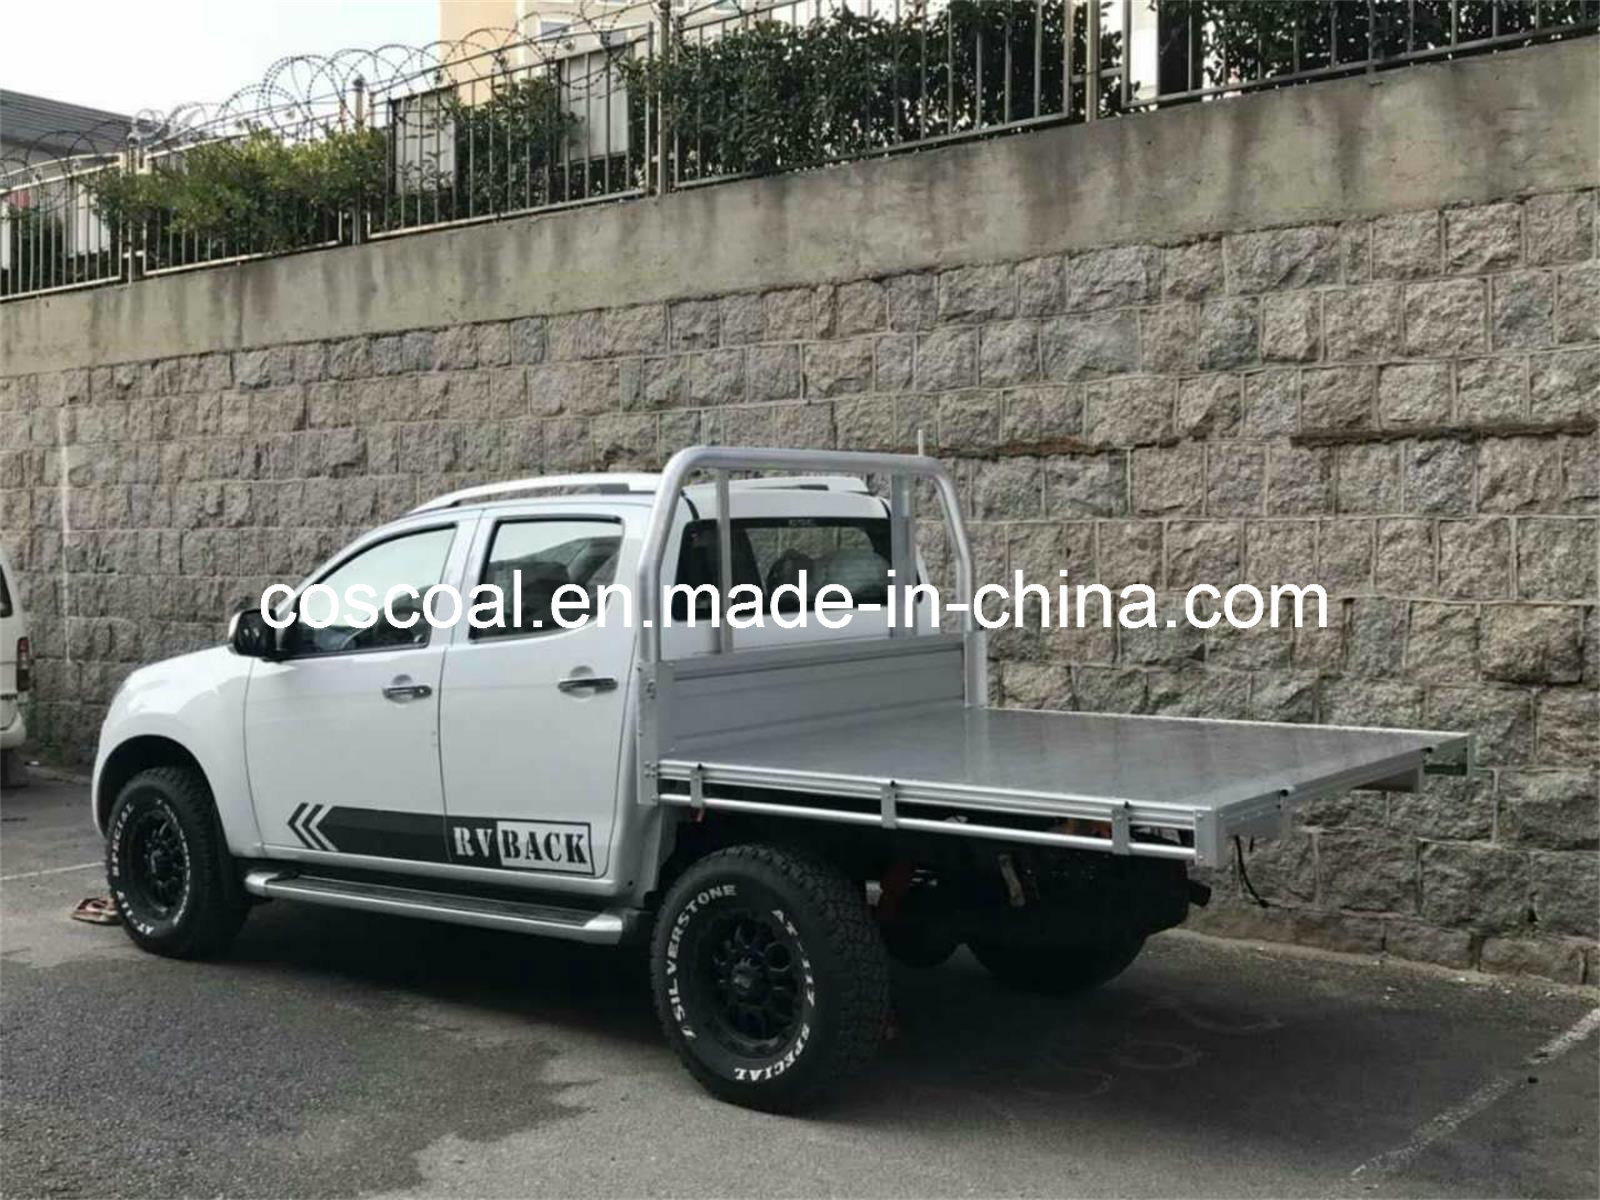 China Extrusion Aluminium Alloy Flatbed For Camper Trailer China Pickup Truck Bed Aluminium Truck Body